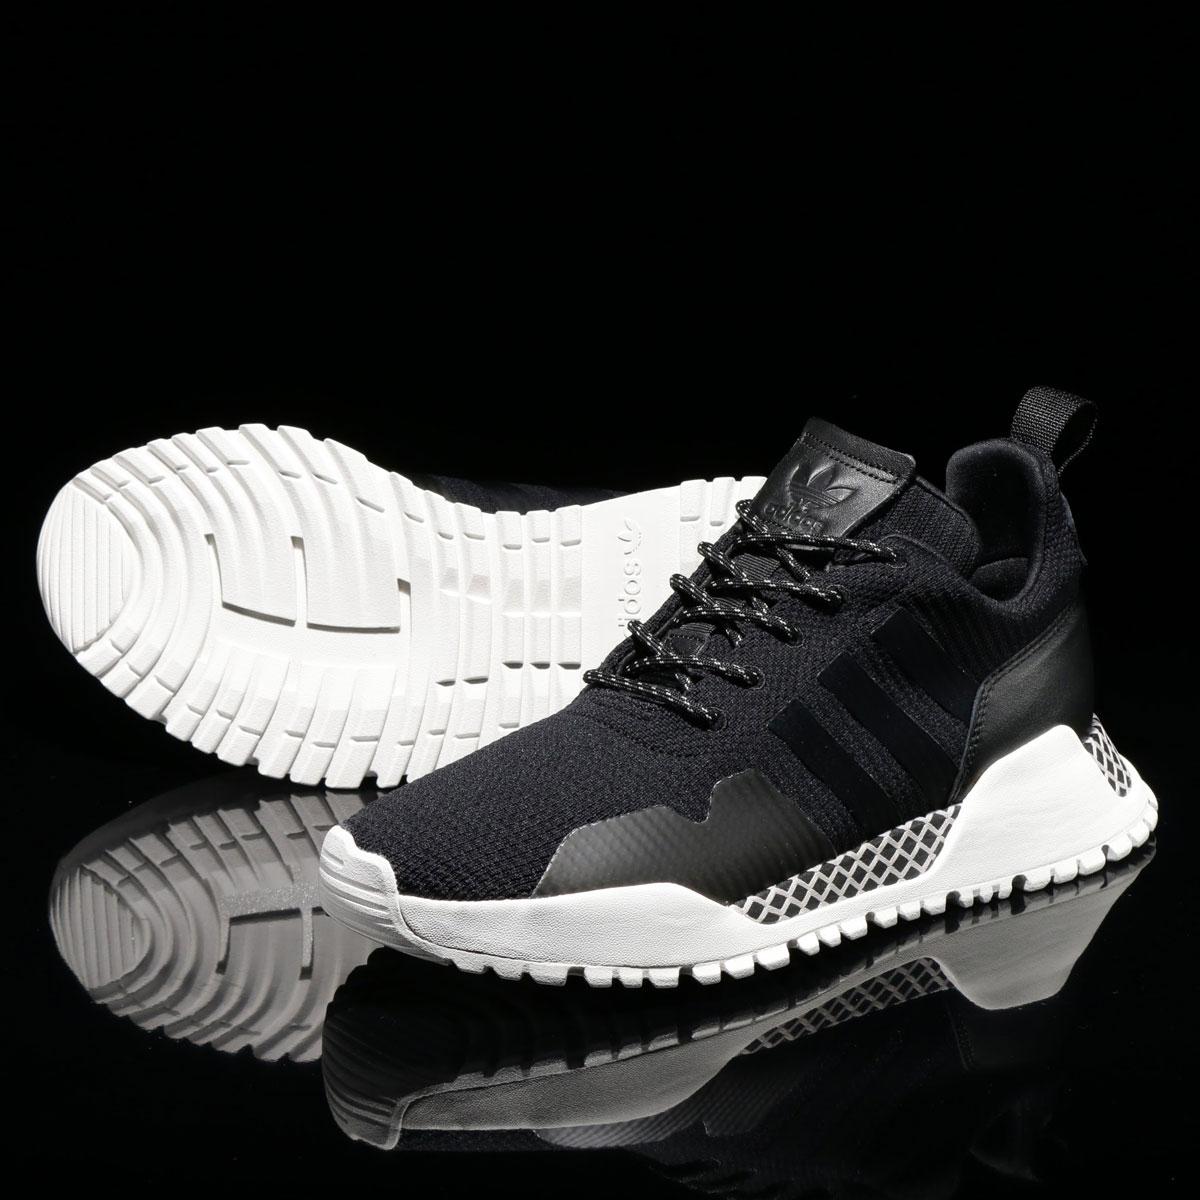 adidas Originals H.F/1.4 PK (アディダス オリジナルス H.F/1.4 PK)Core Black/Core Black/Vintage White【メンズ スニーカー】17FW-I